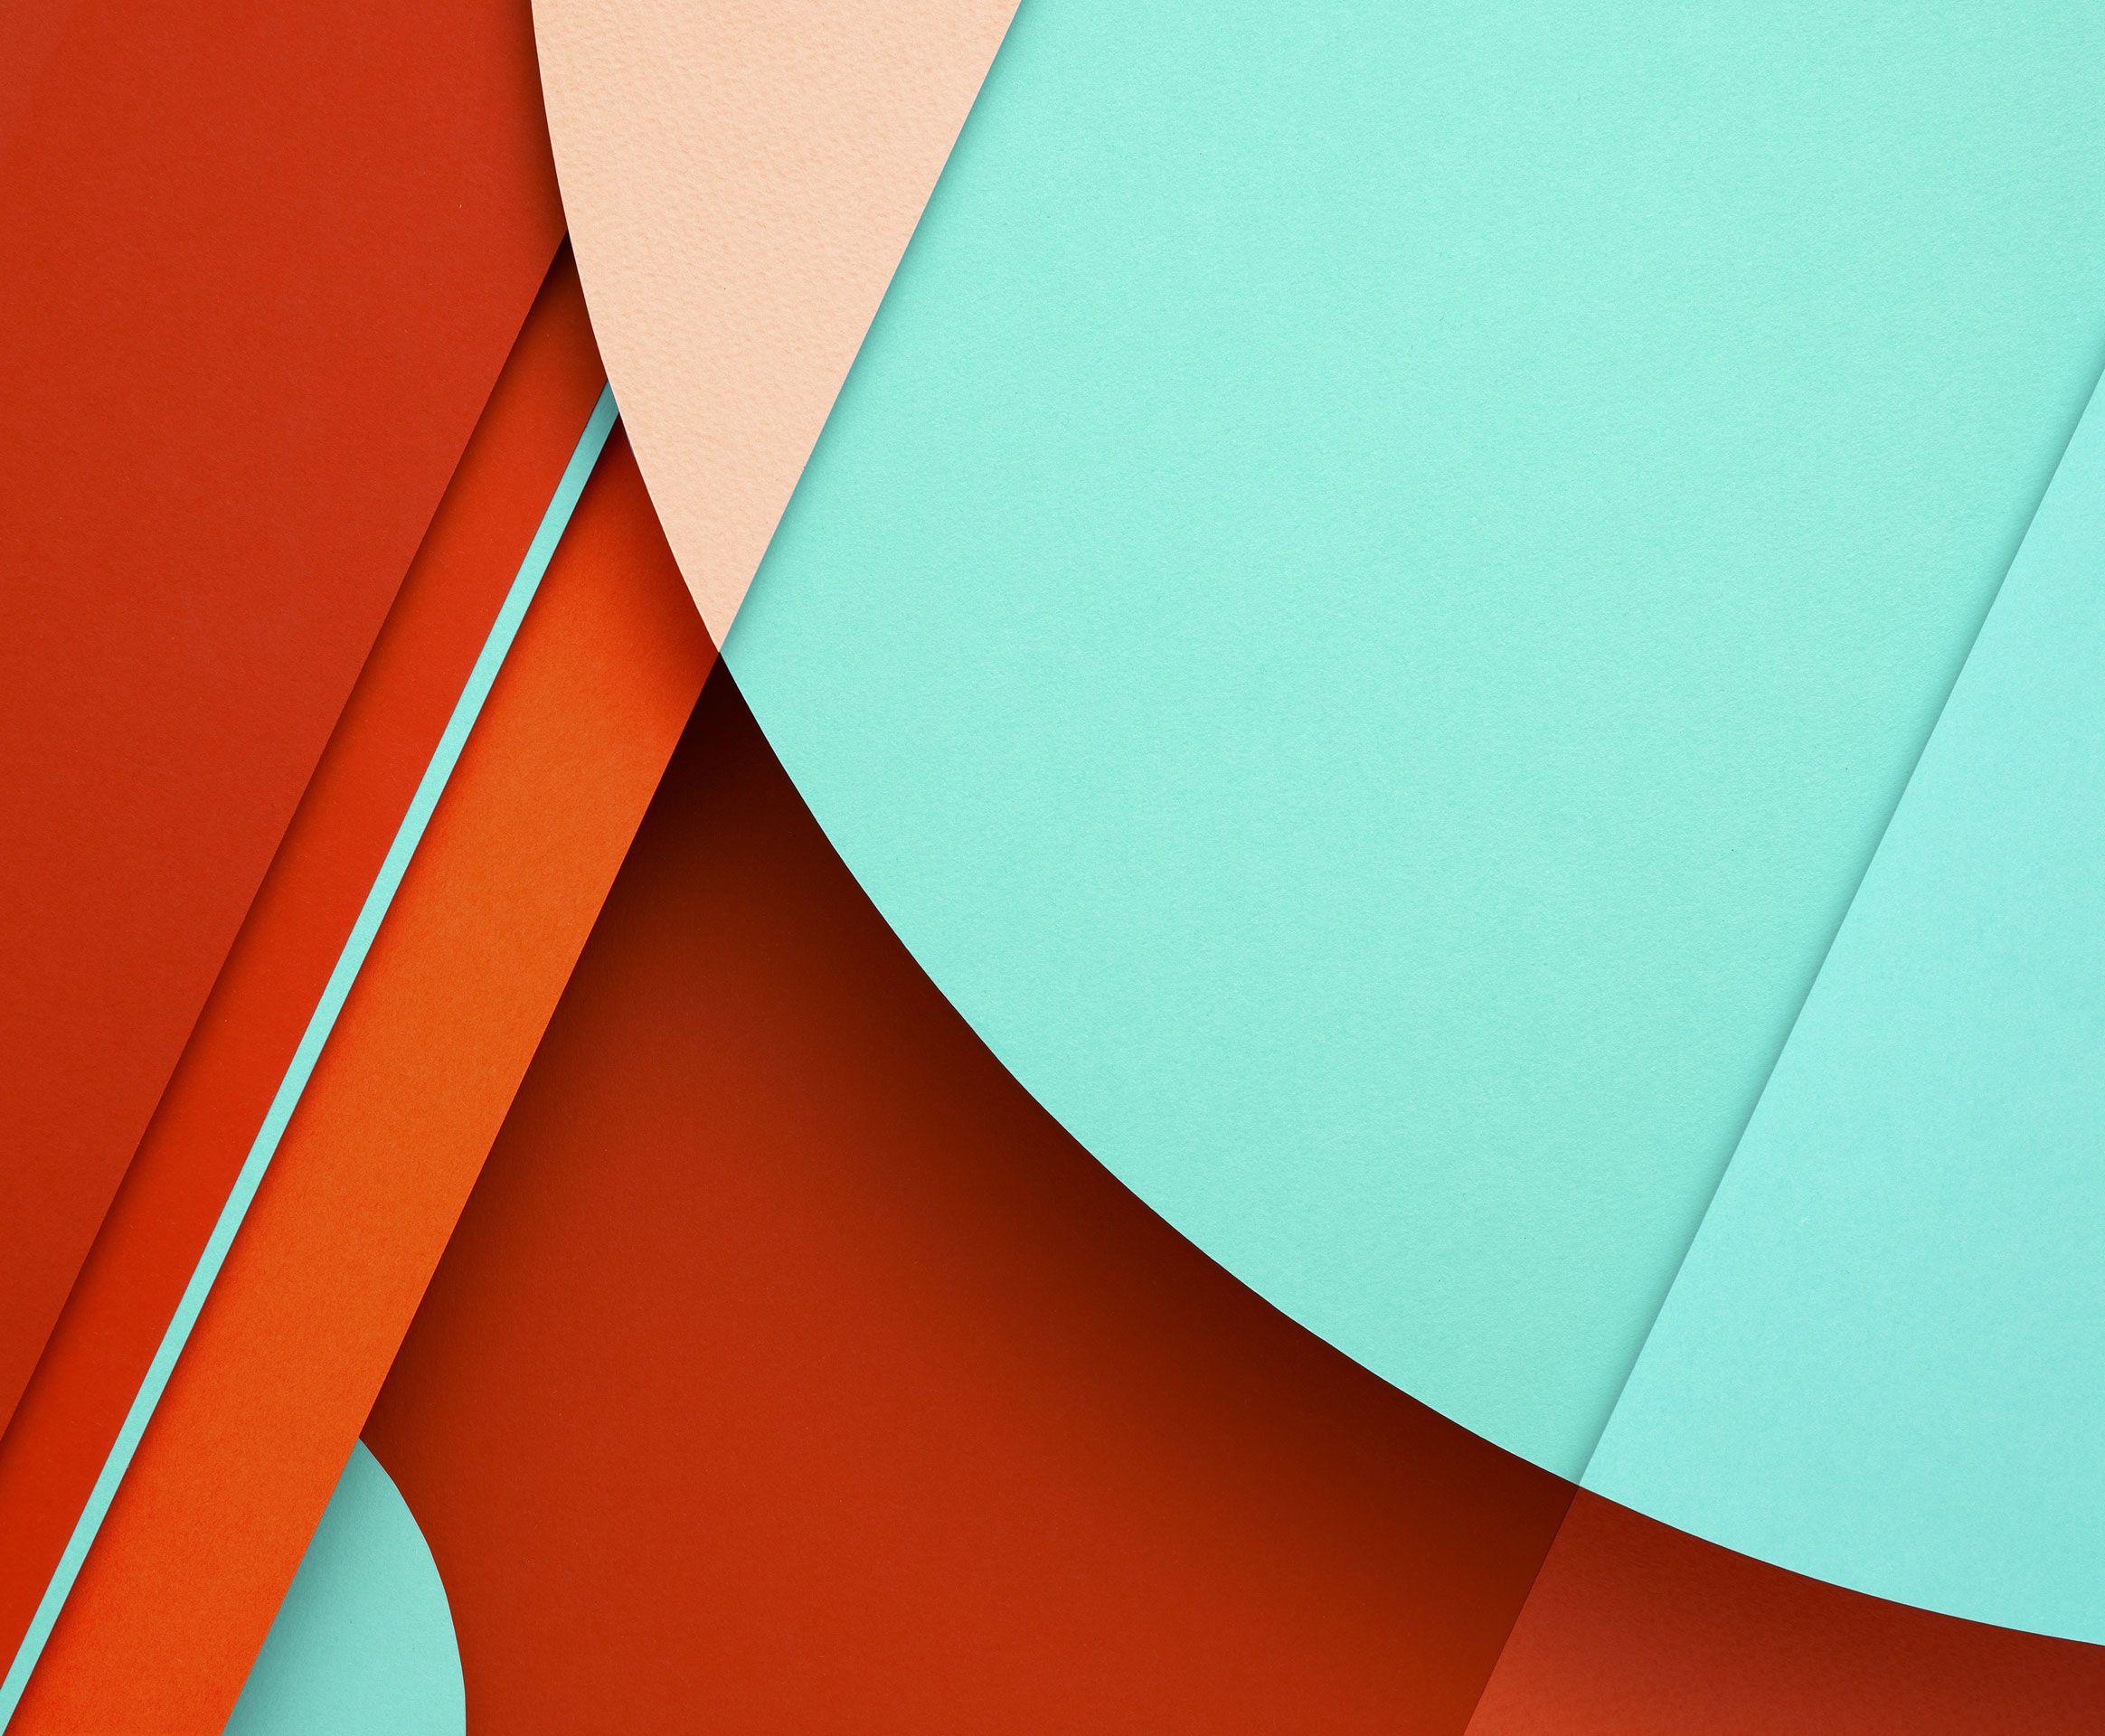 Android5 For Nexus デフォルト壁紙ダウンロード Sumacase Com